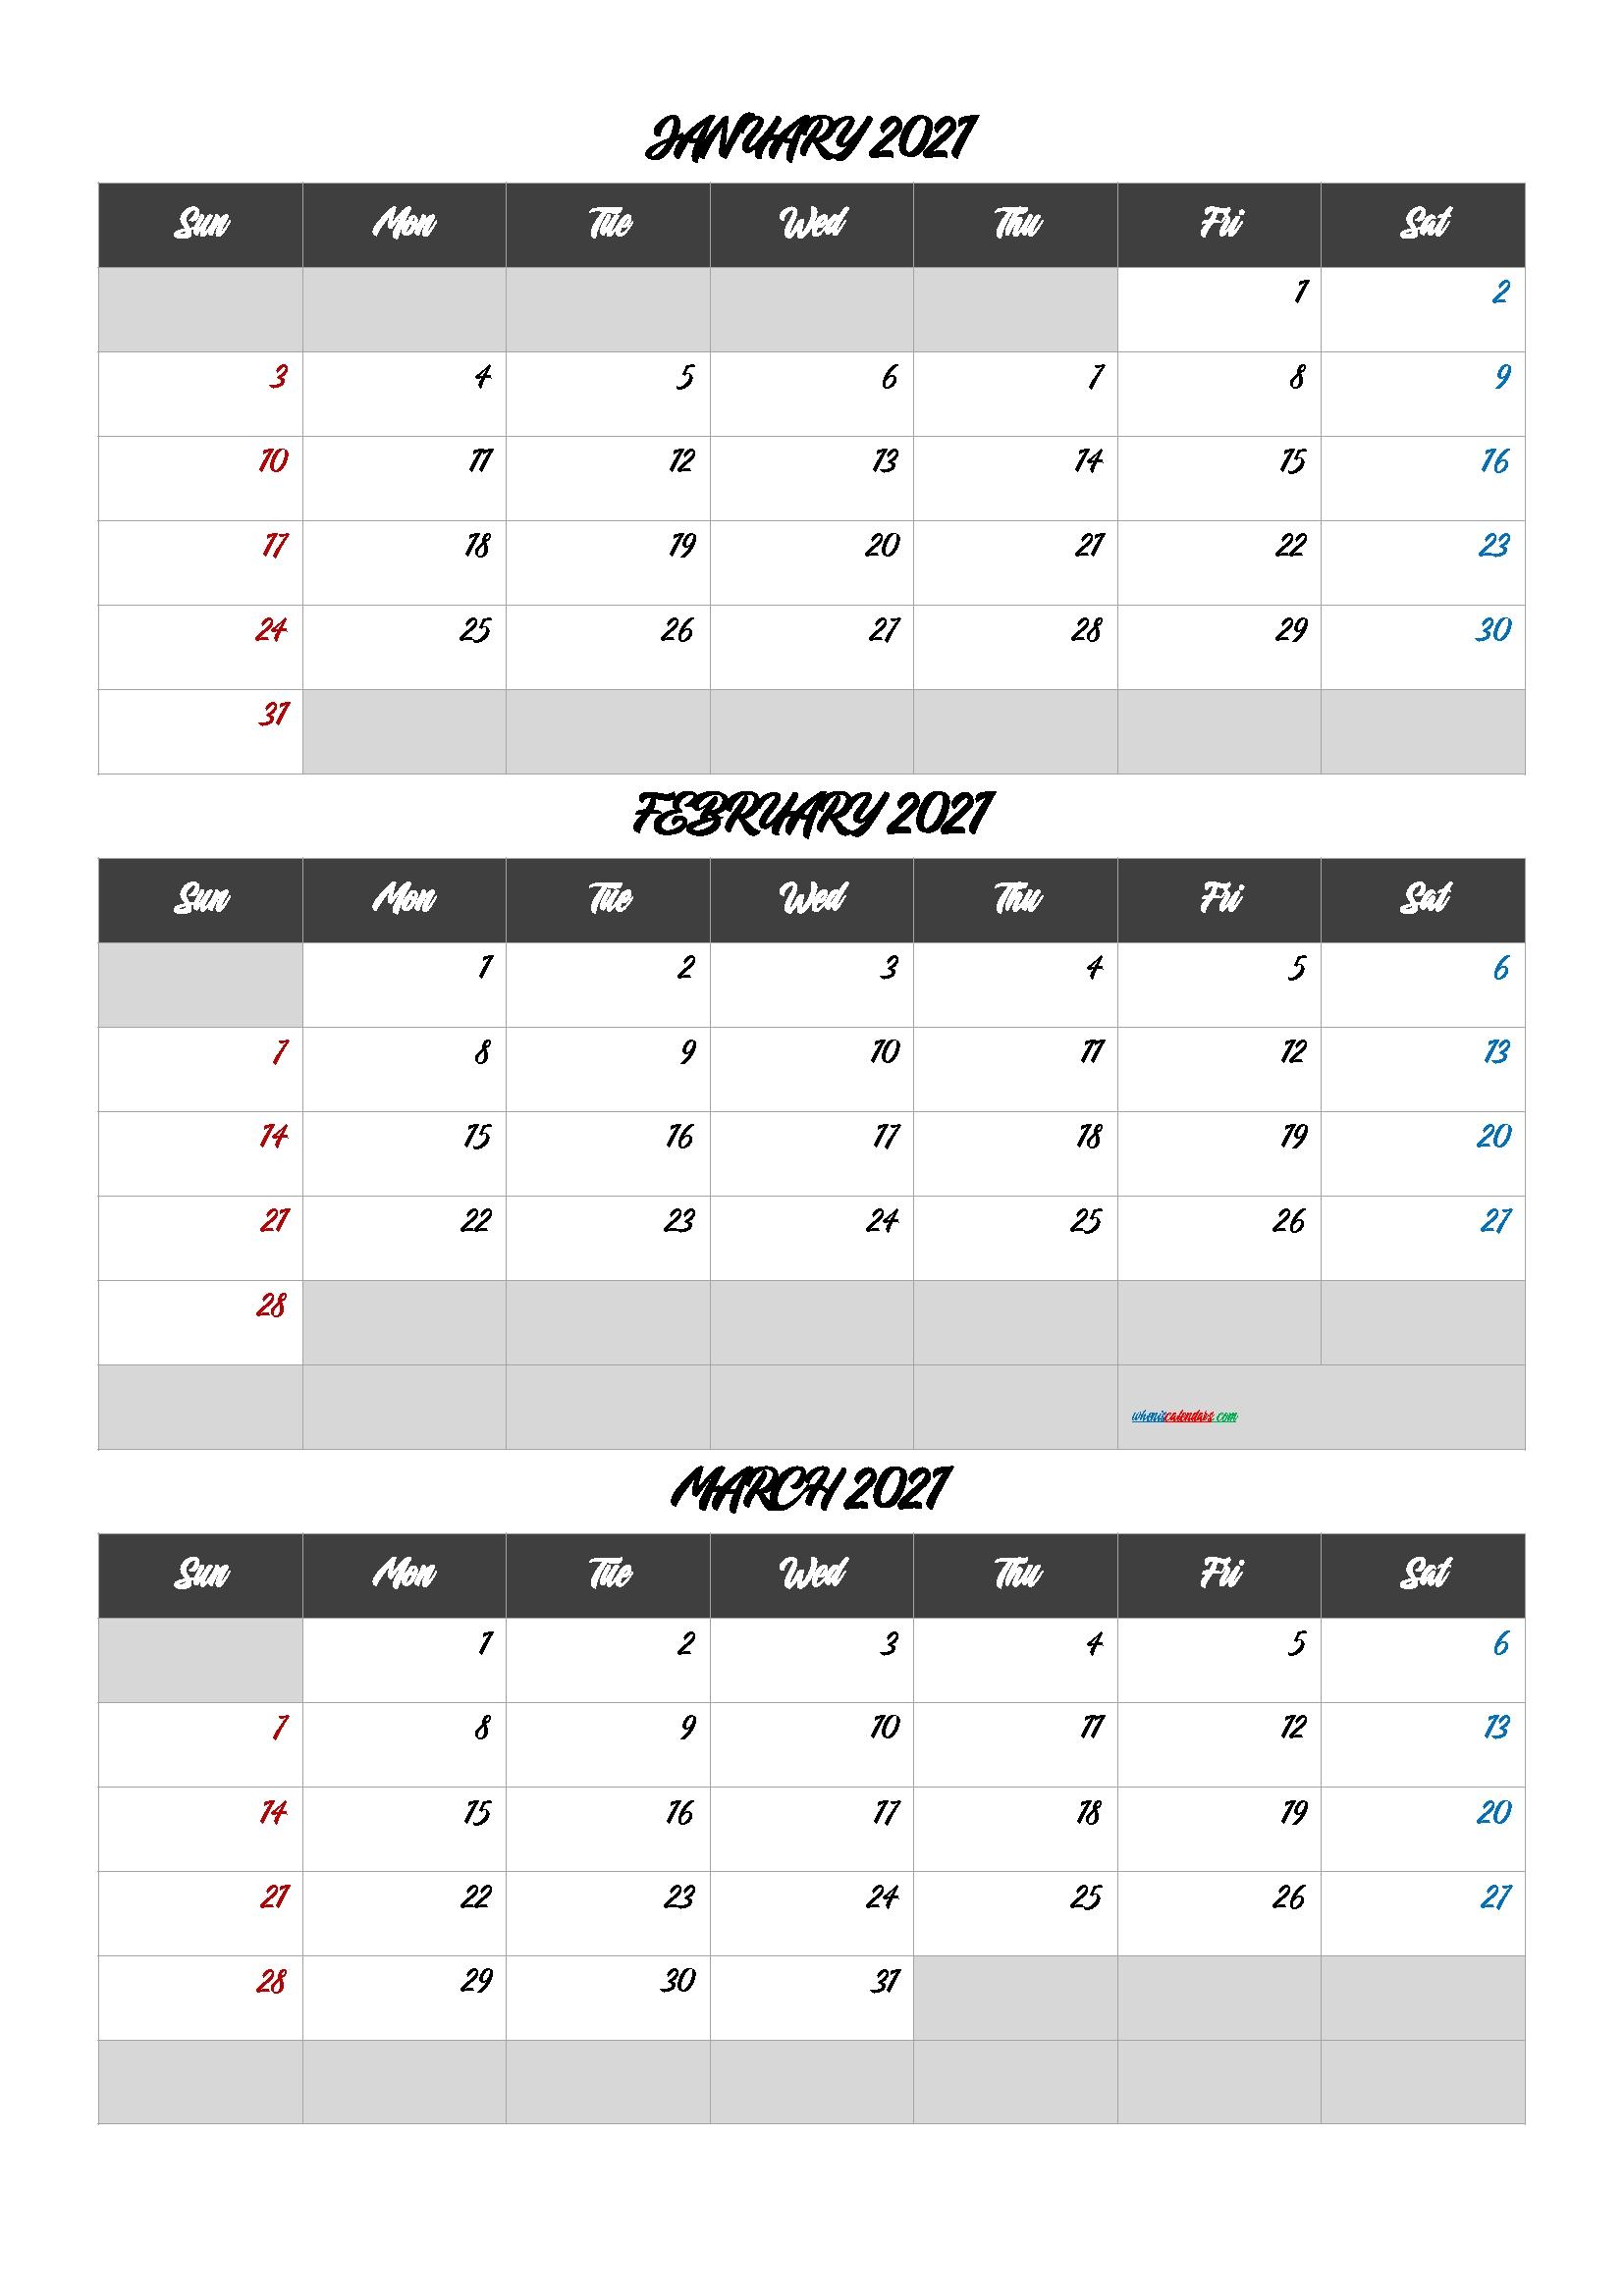 January February March 2021 Printable Calendar [Q1-Q2-Q3-Q4